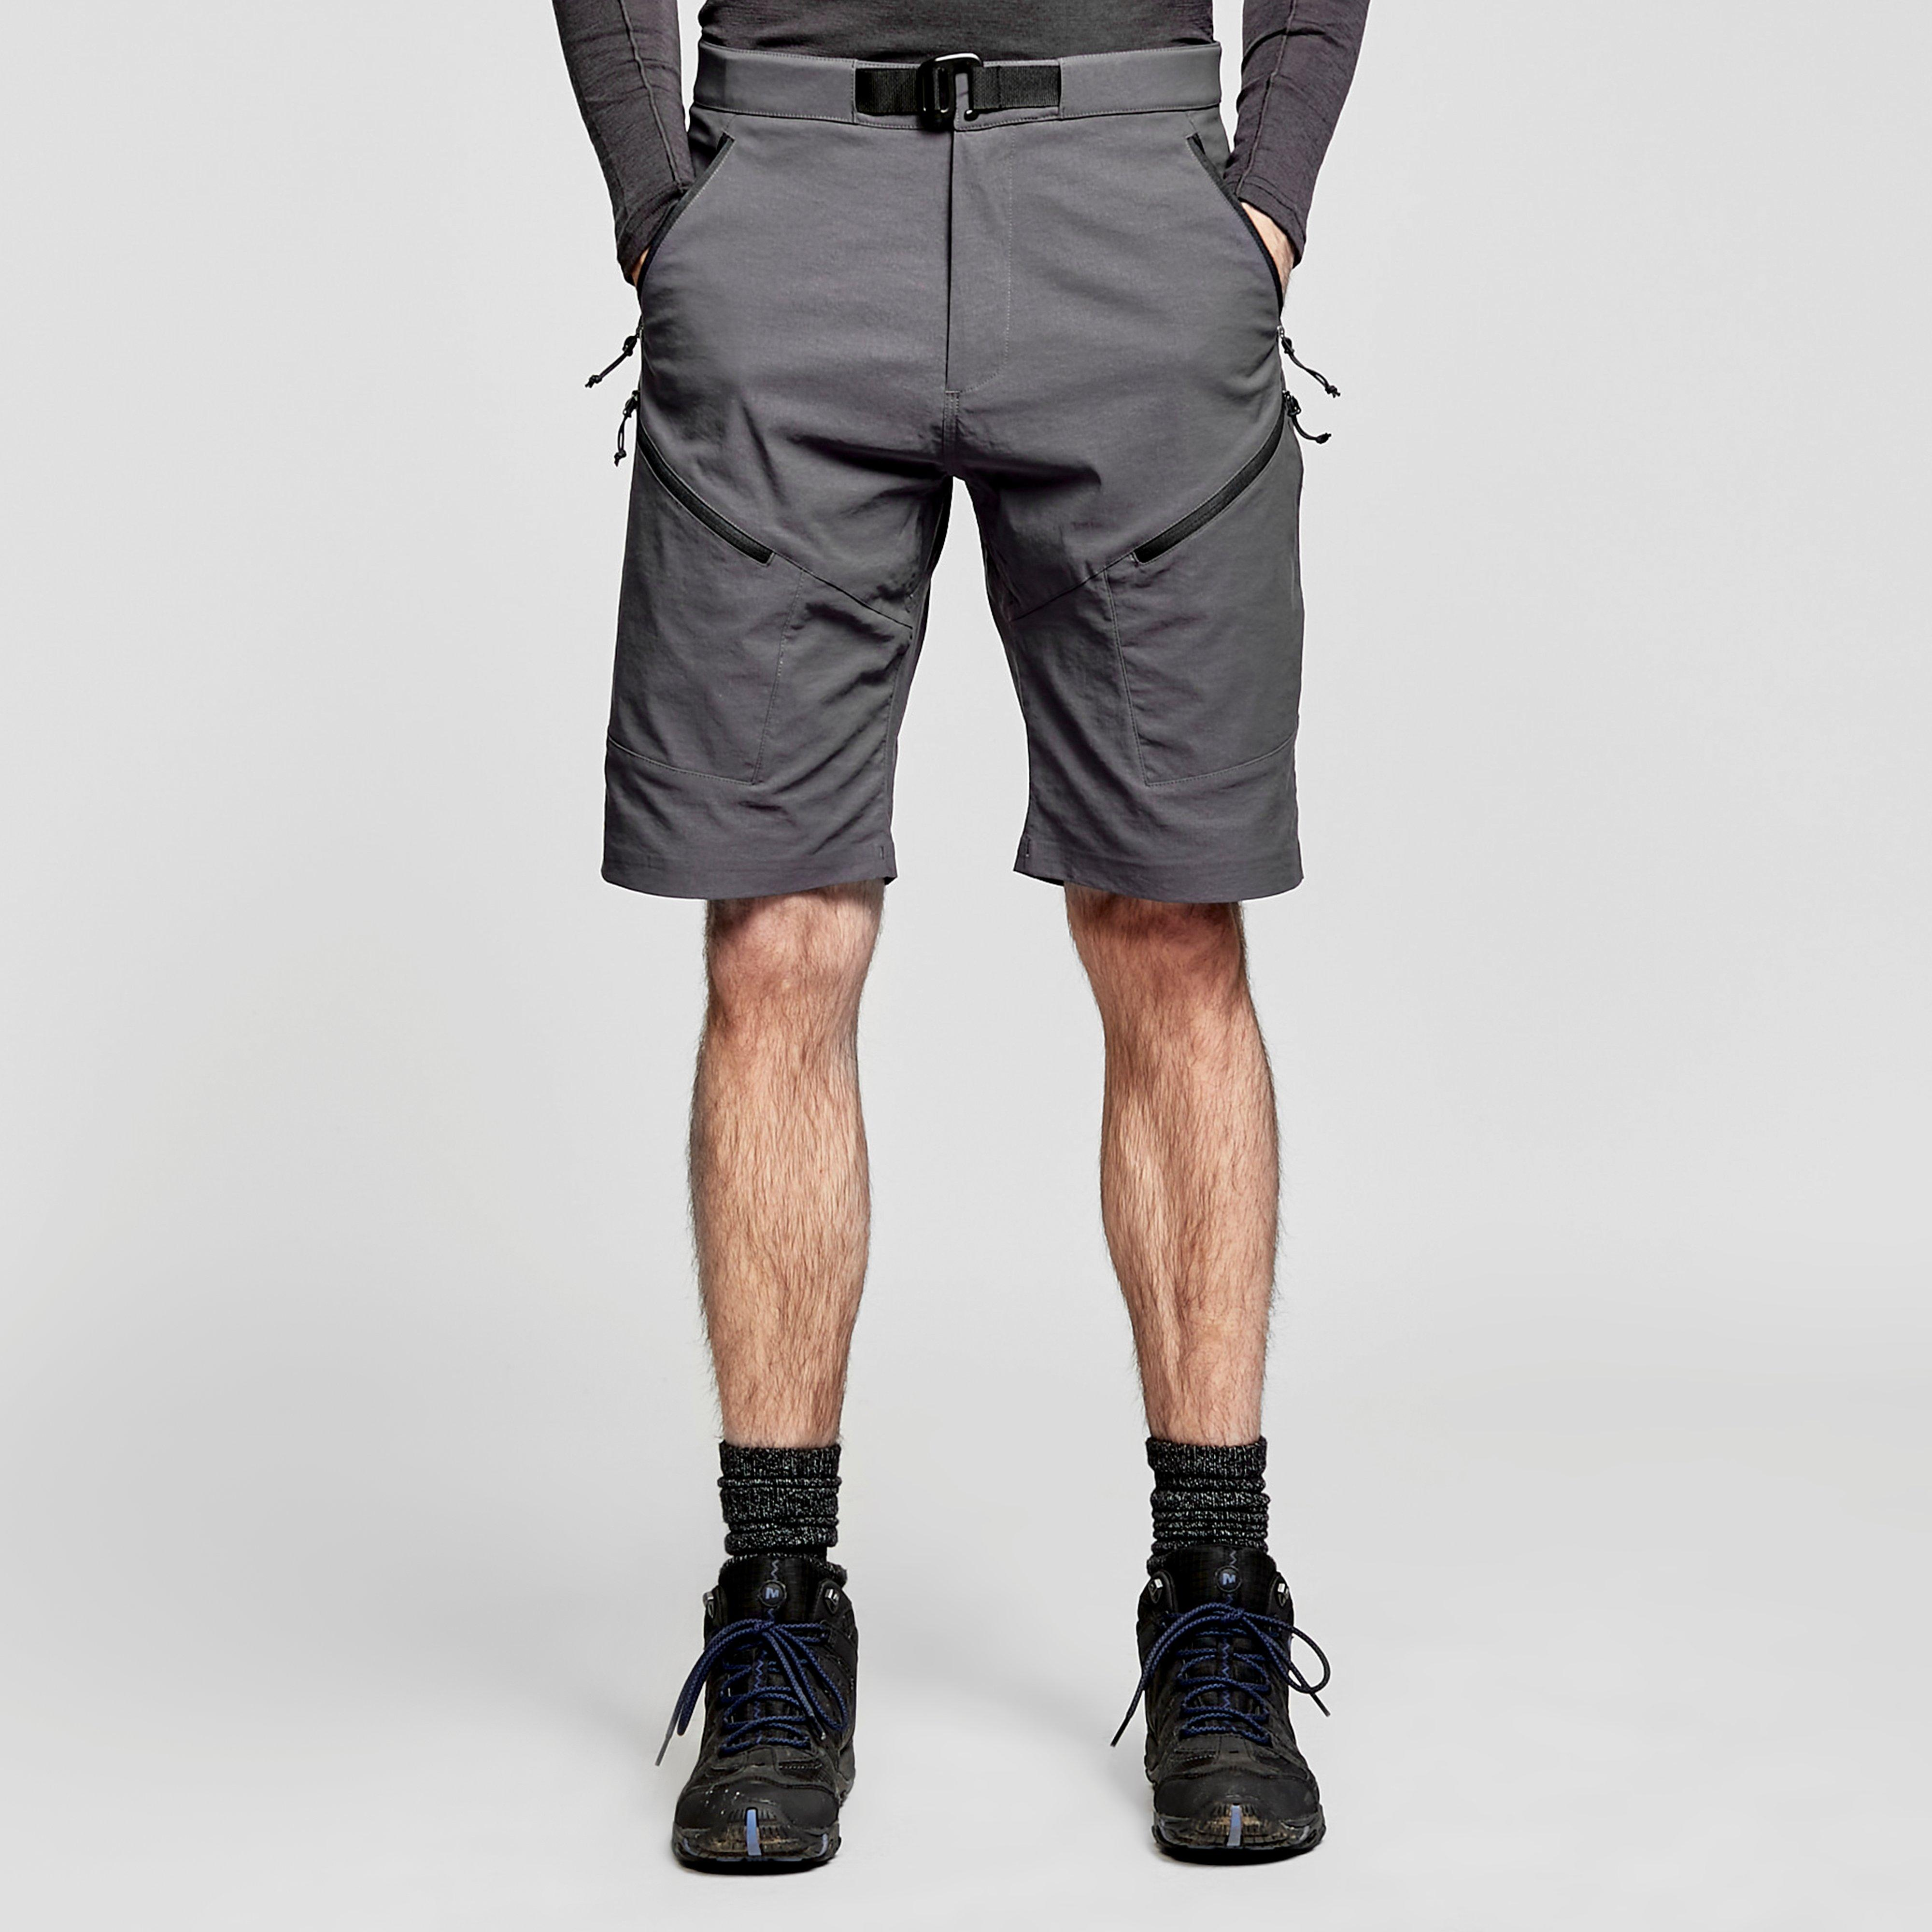 Oex Men's Brora Shorts - Grey, Grey